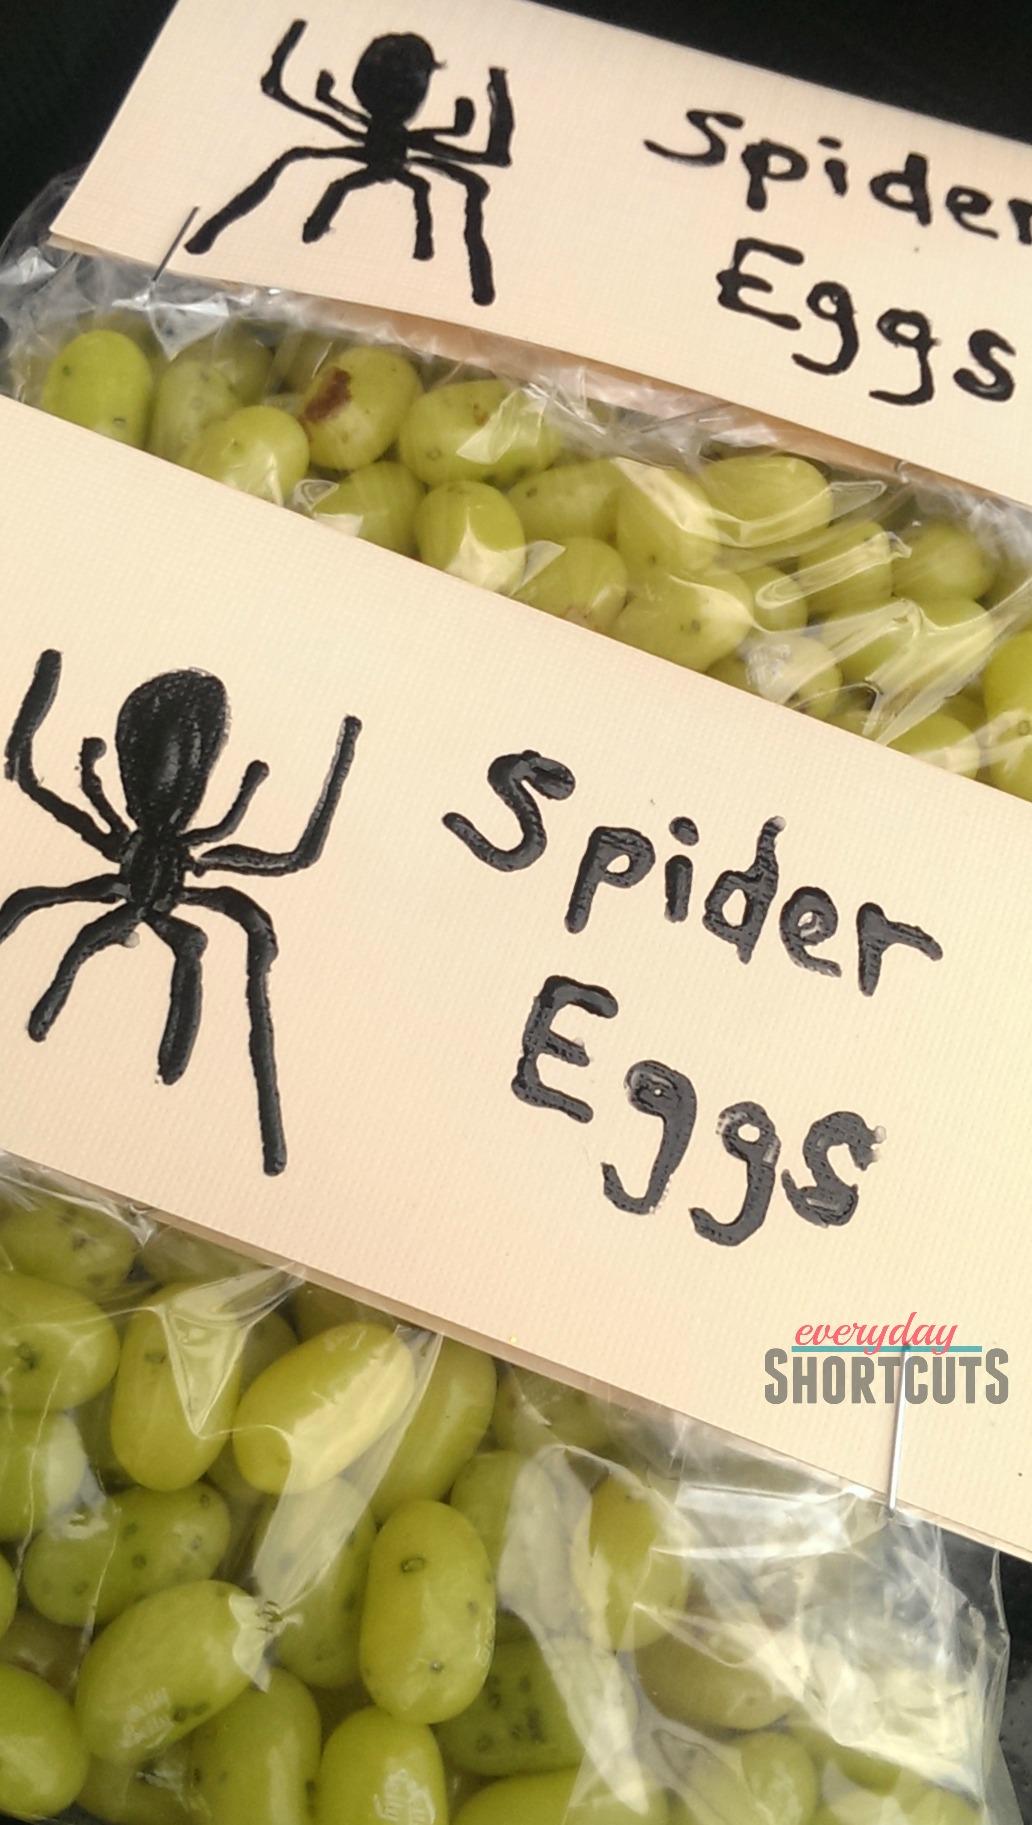 spider-eggs